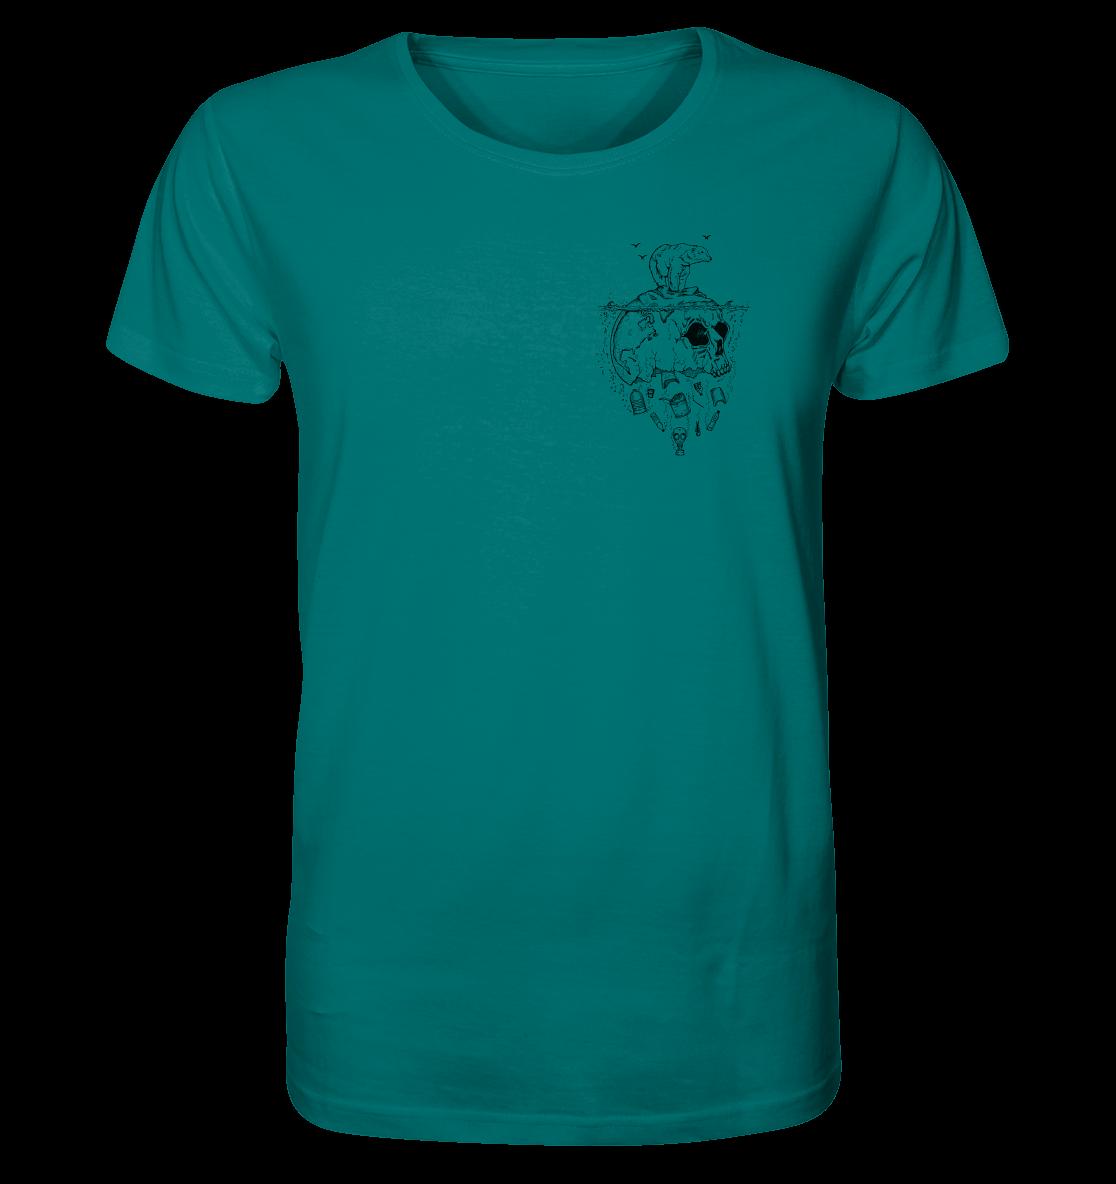 front-organic-shirt-007373-1116x-32.png